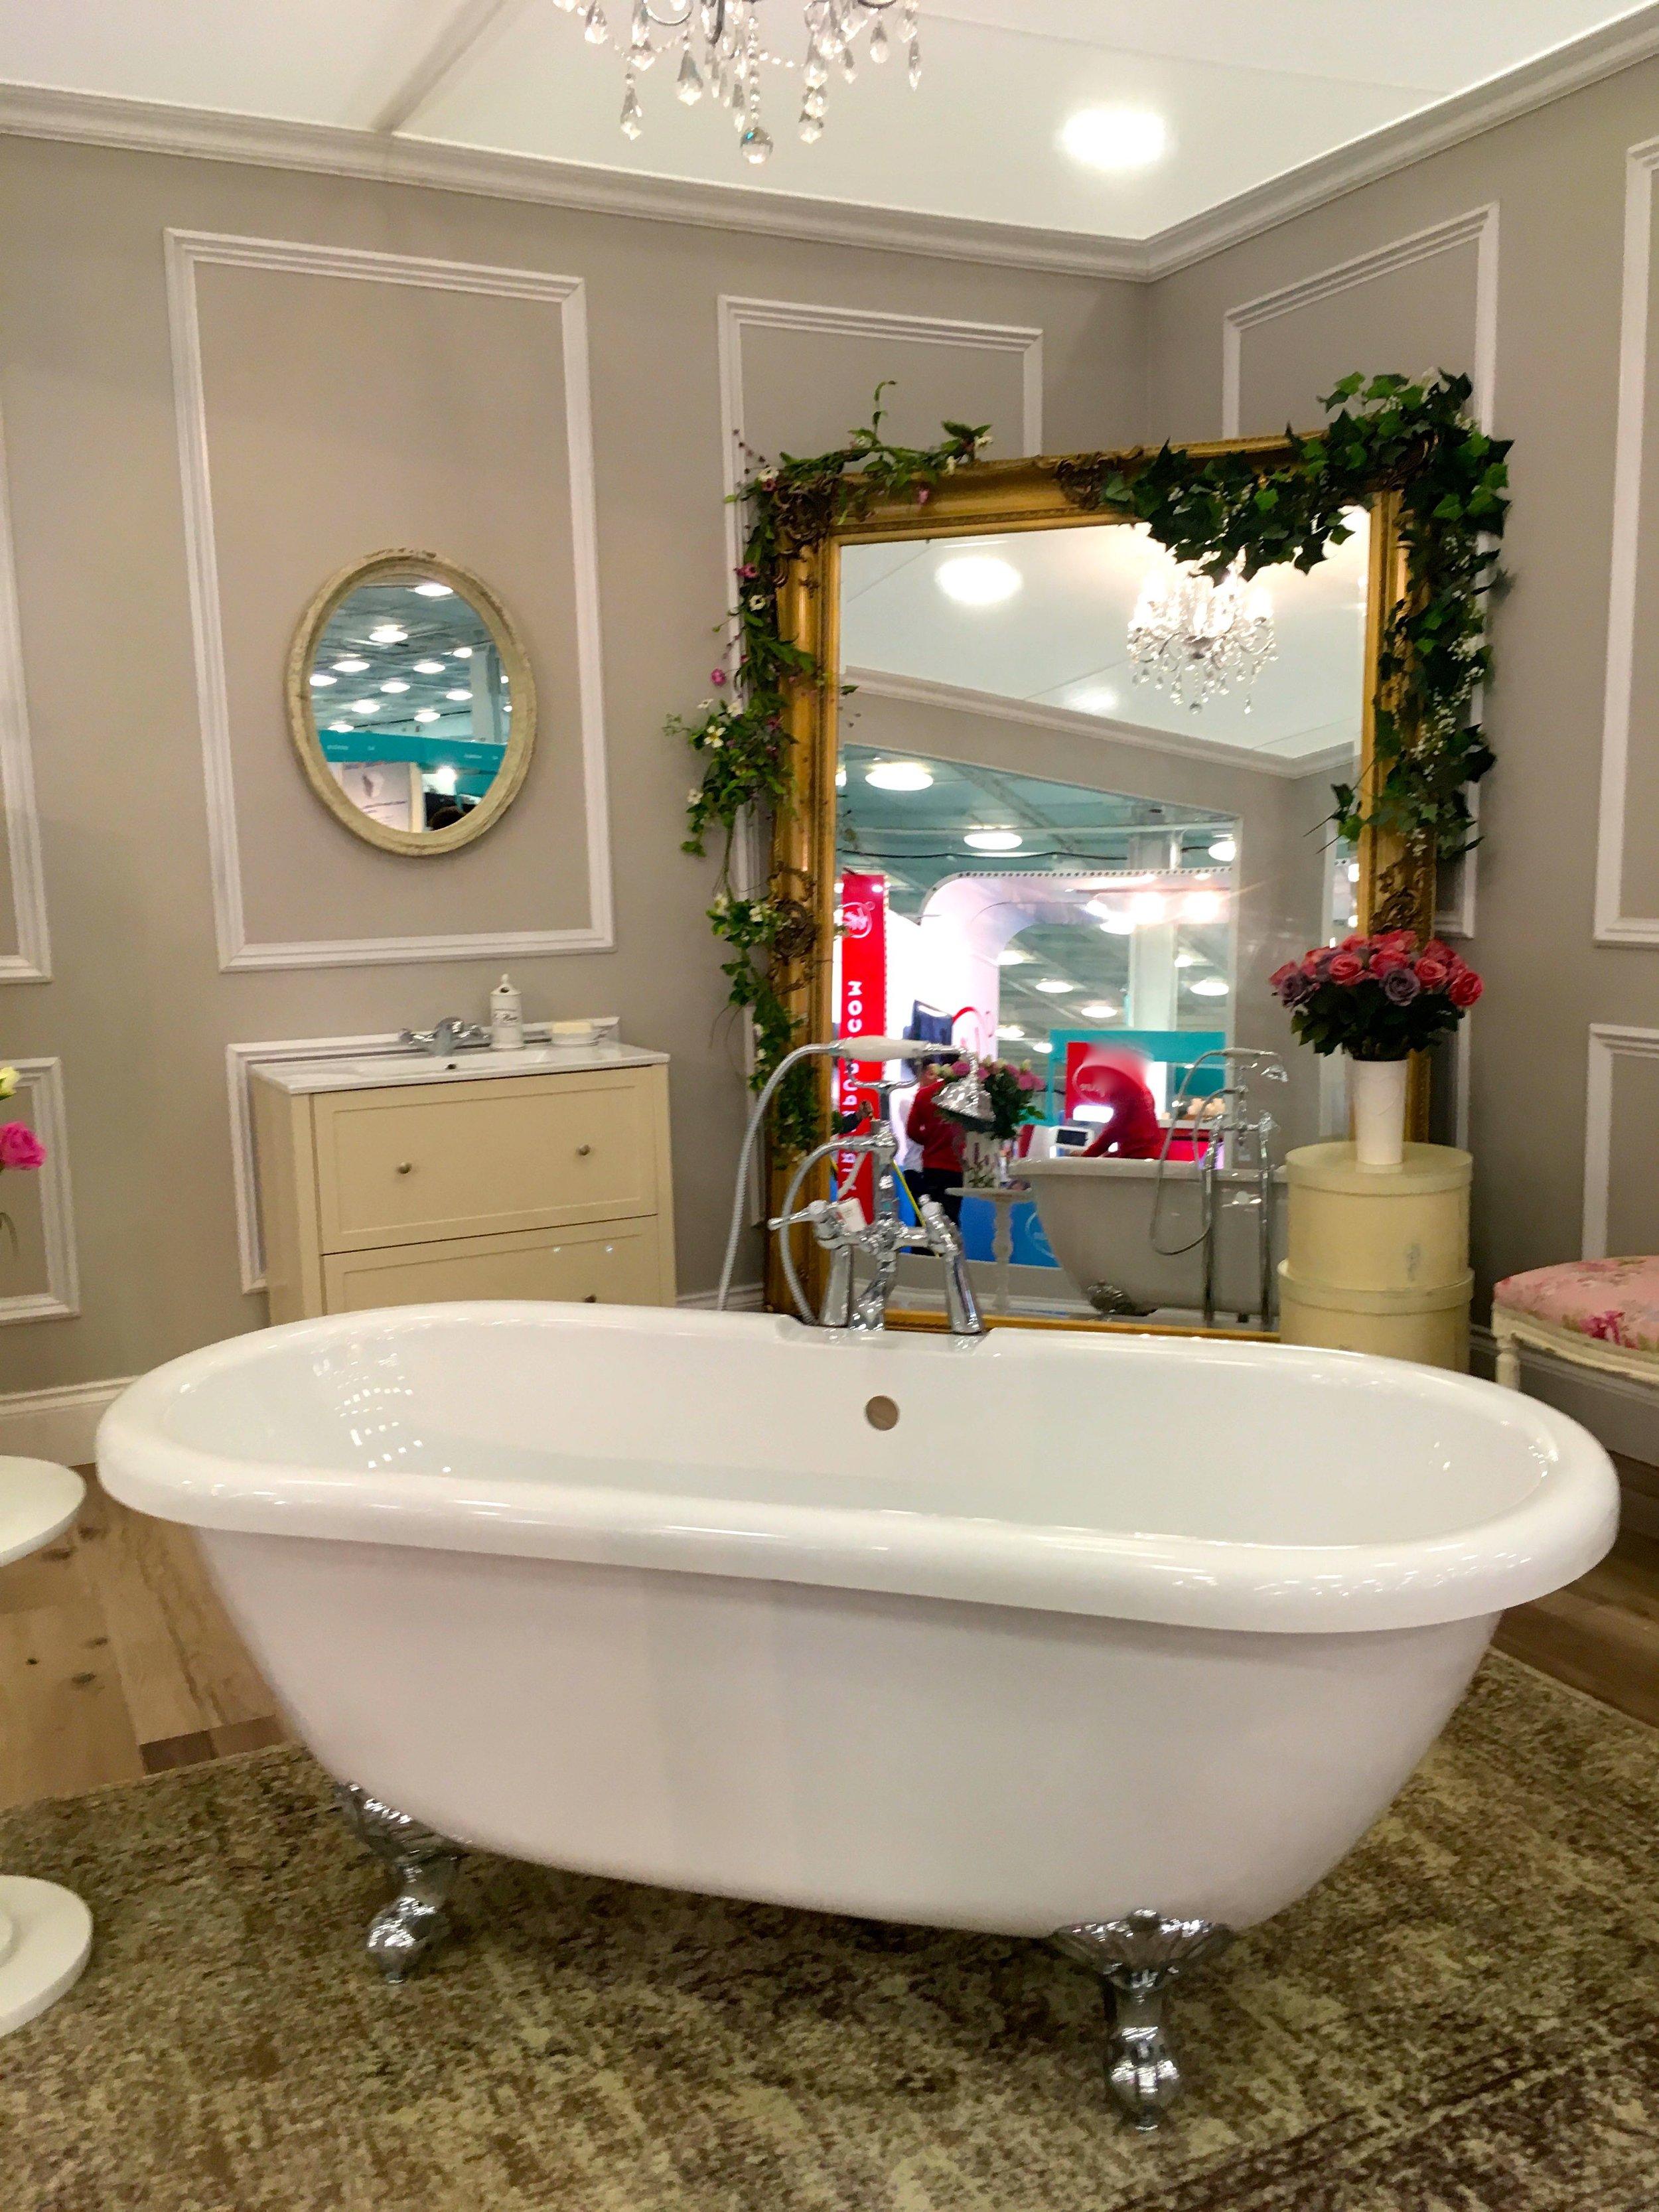 A standalone bathtub and mirror